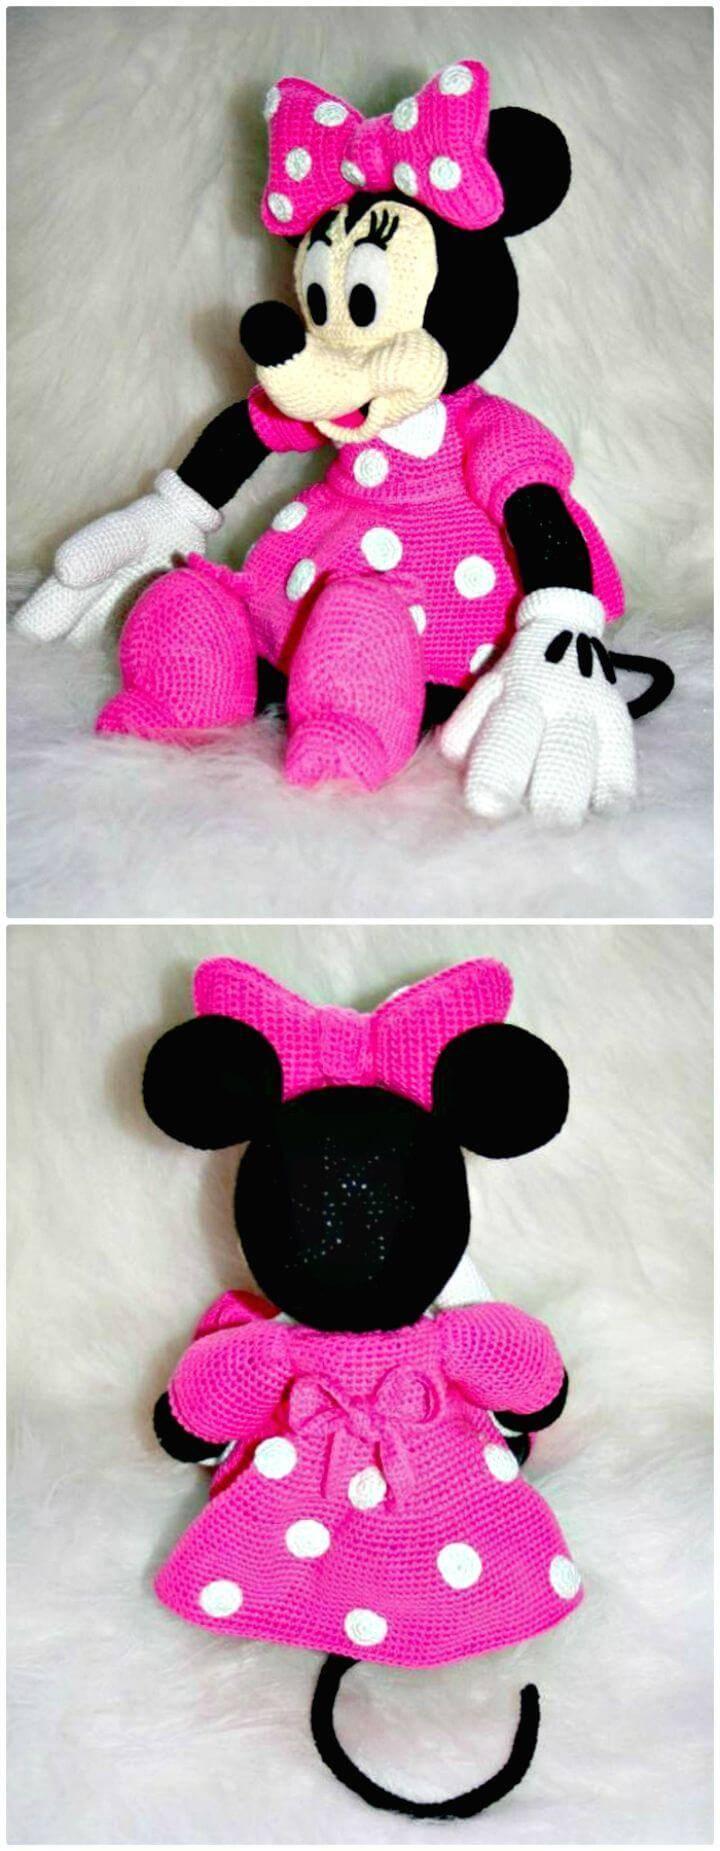 Crochet Mickey Mouse Patterns Hat Amigurumi Diy Amp Crafts